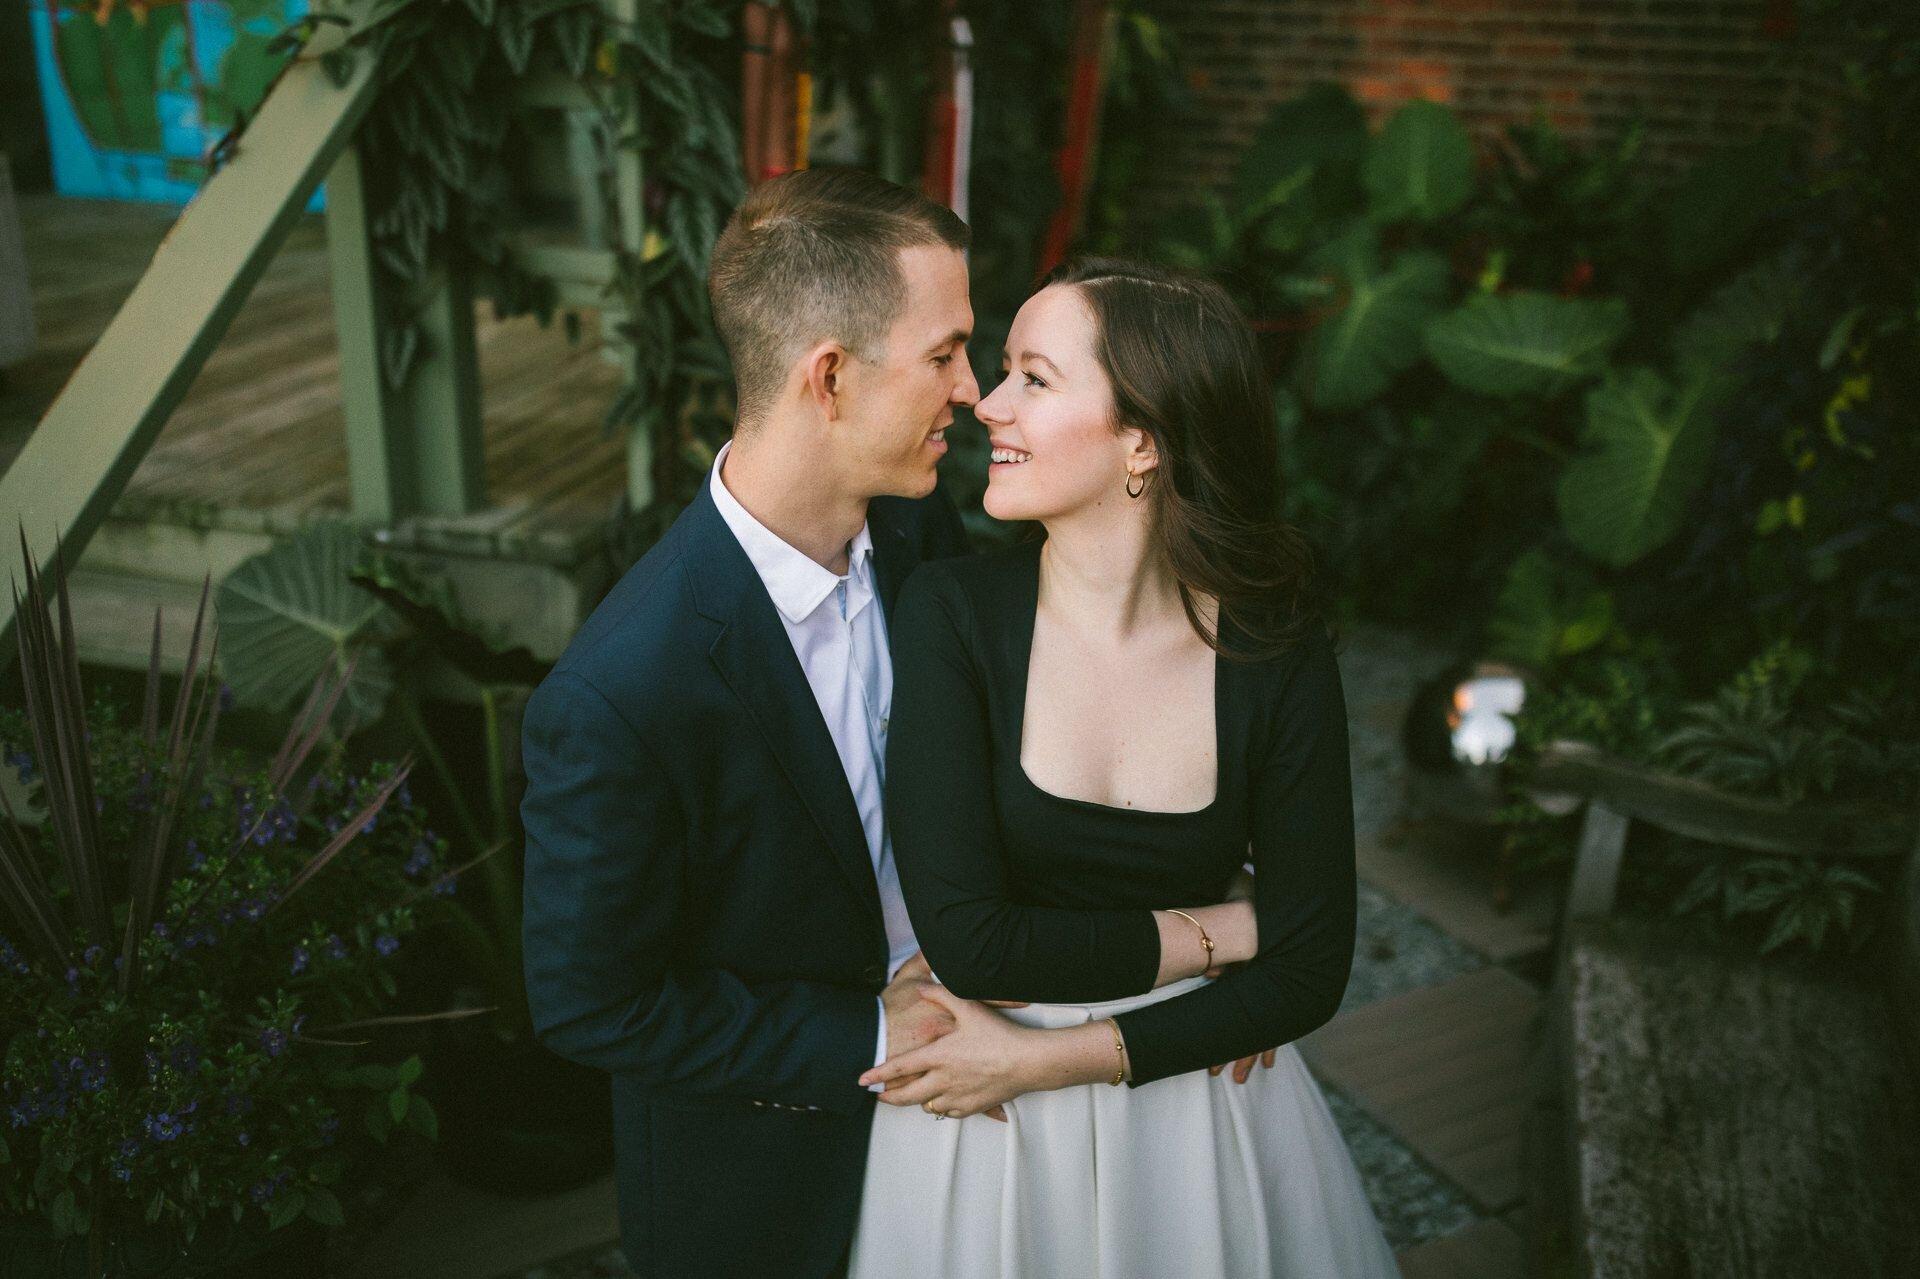 78th Street Studio Engagement and Wedding Photographer 9.jpg